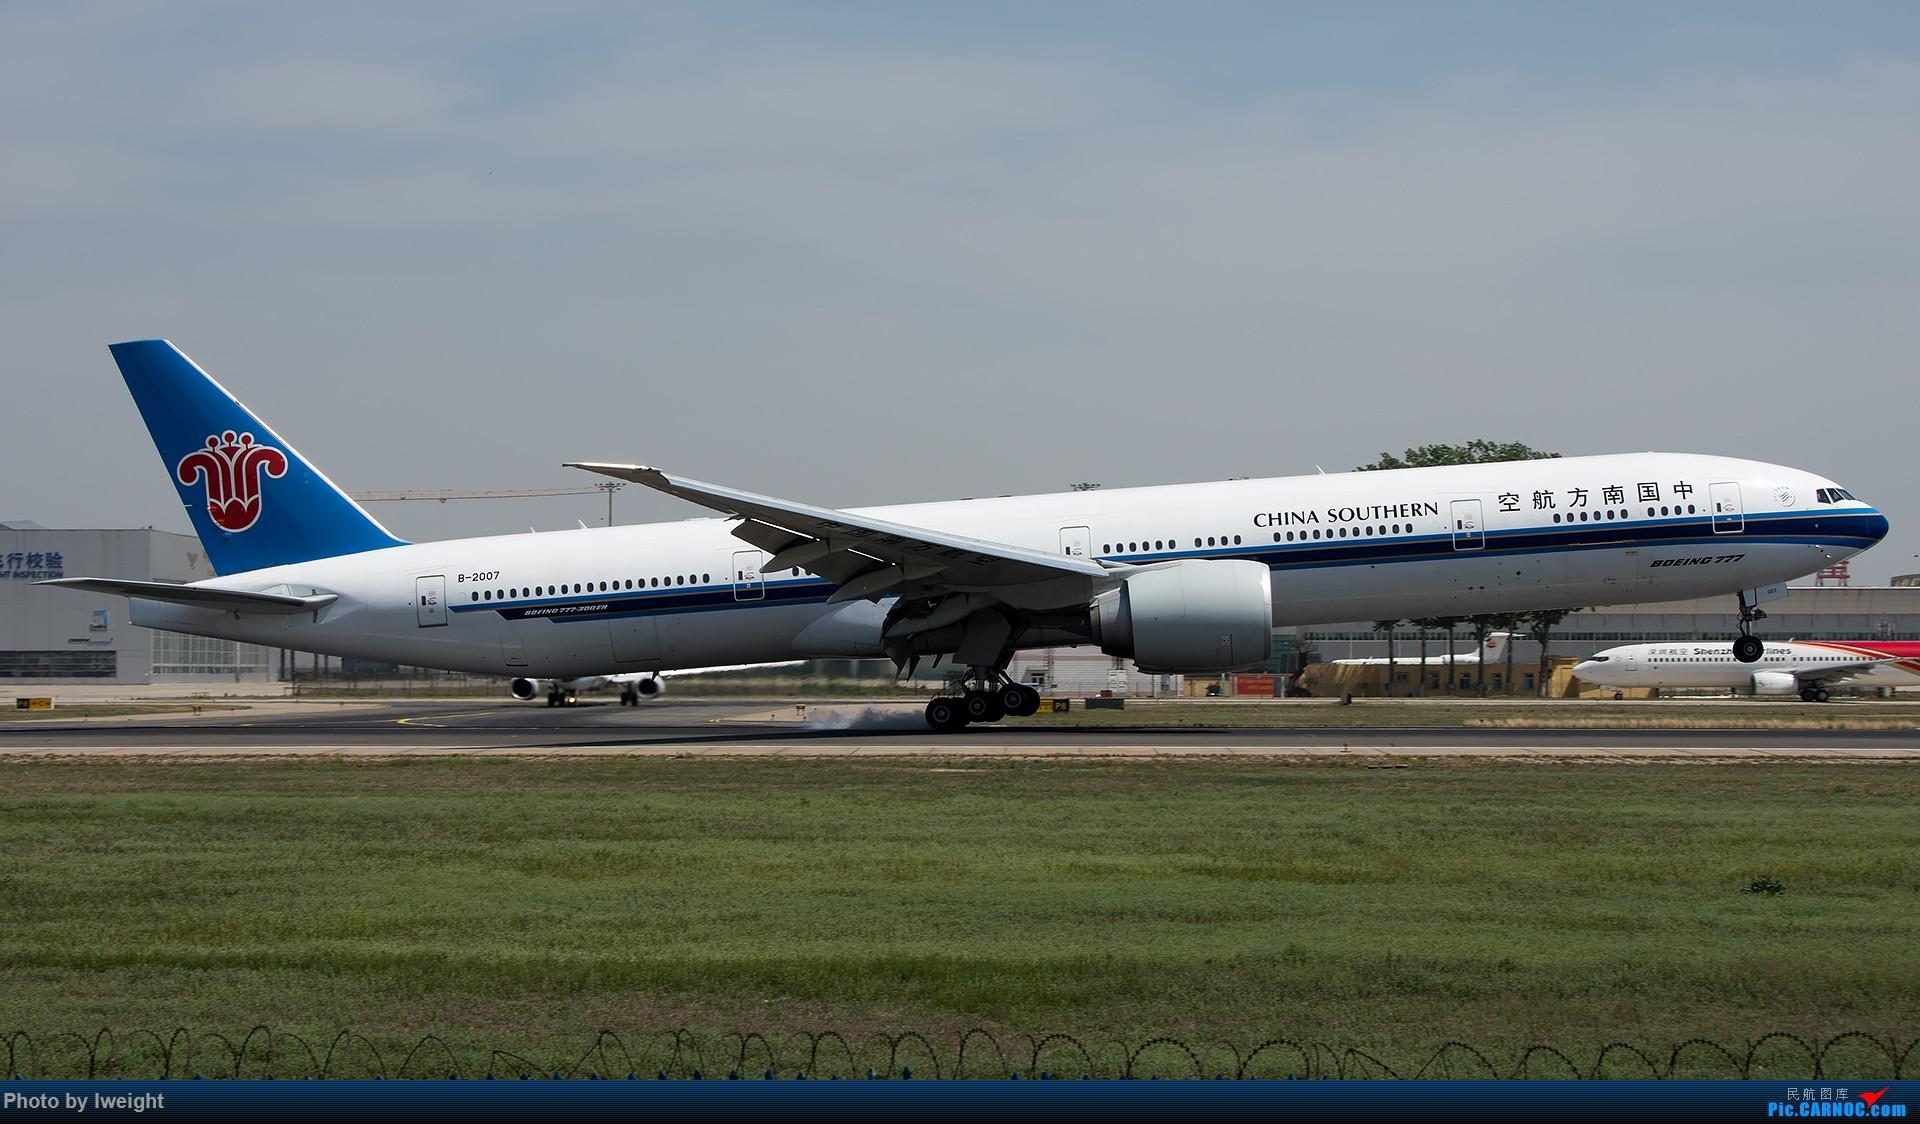 Re:[原创]天气晴朗,继续守候18R【多图】 BOEING 777-300ER B-2007 中国北京首都国际机场